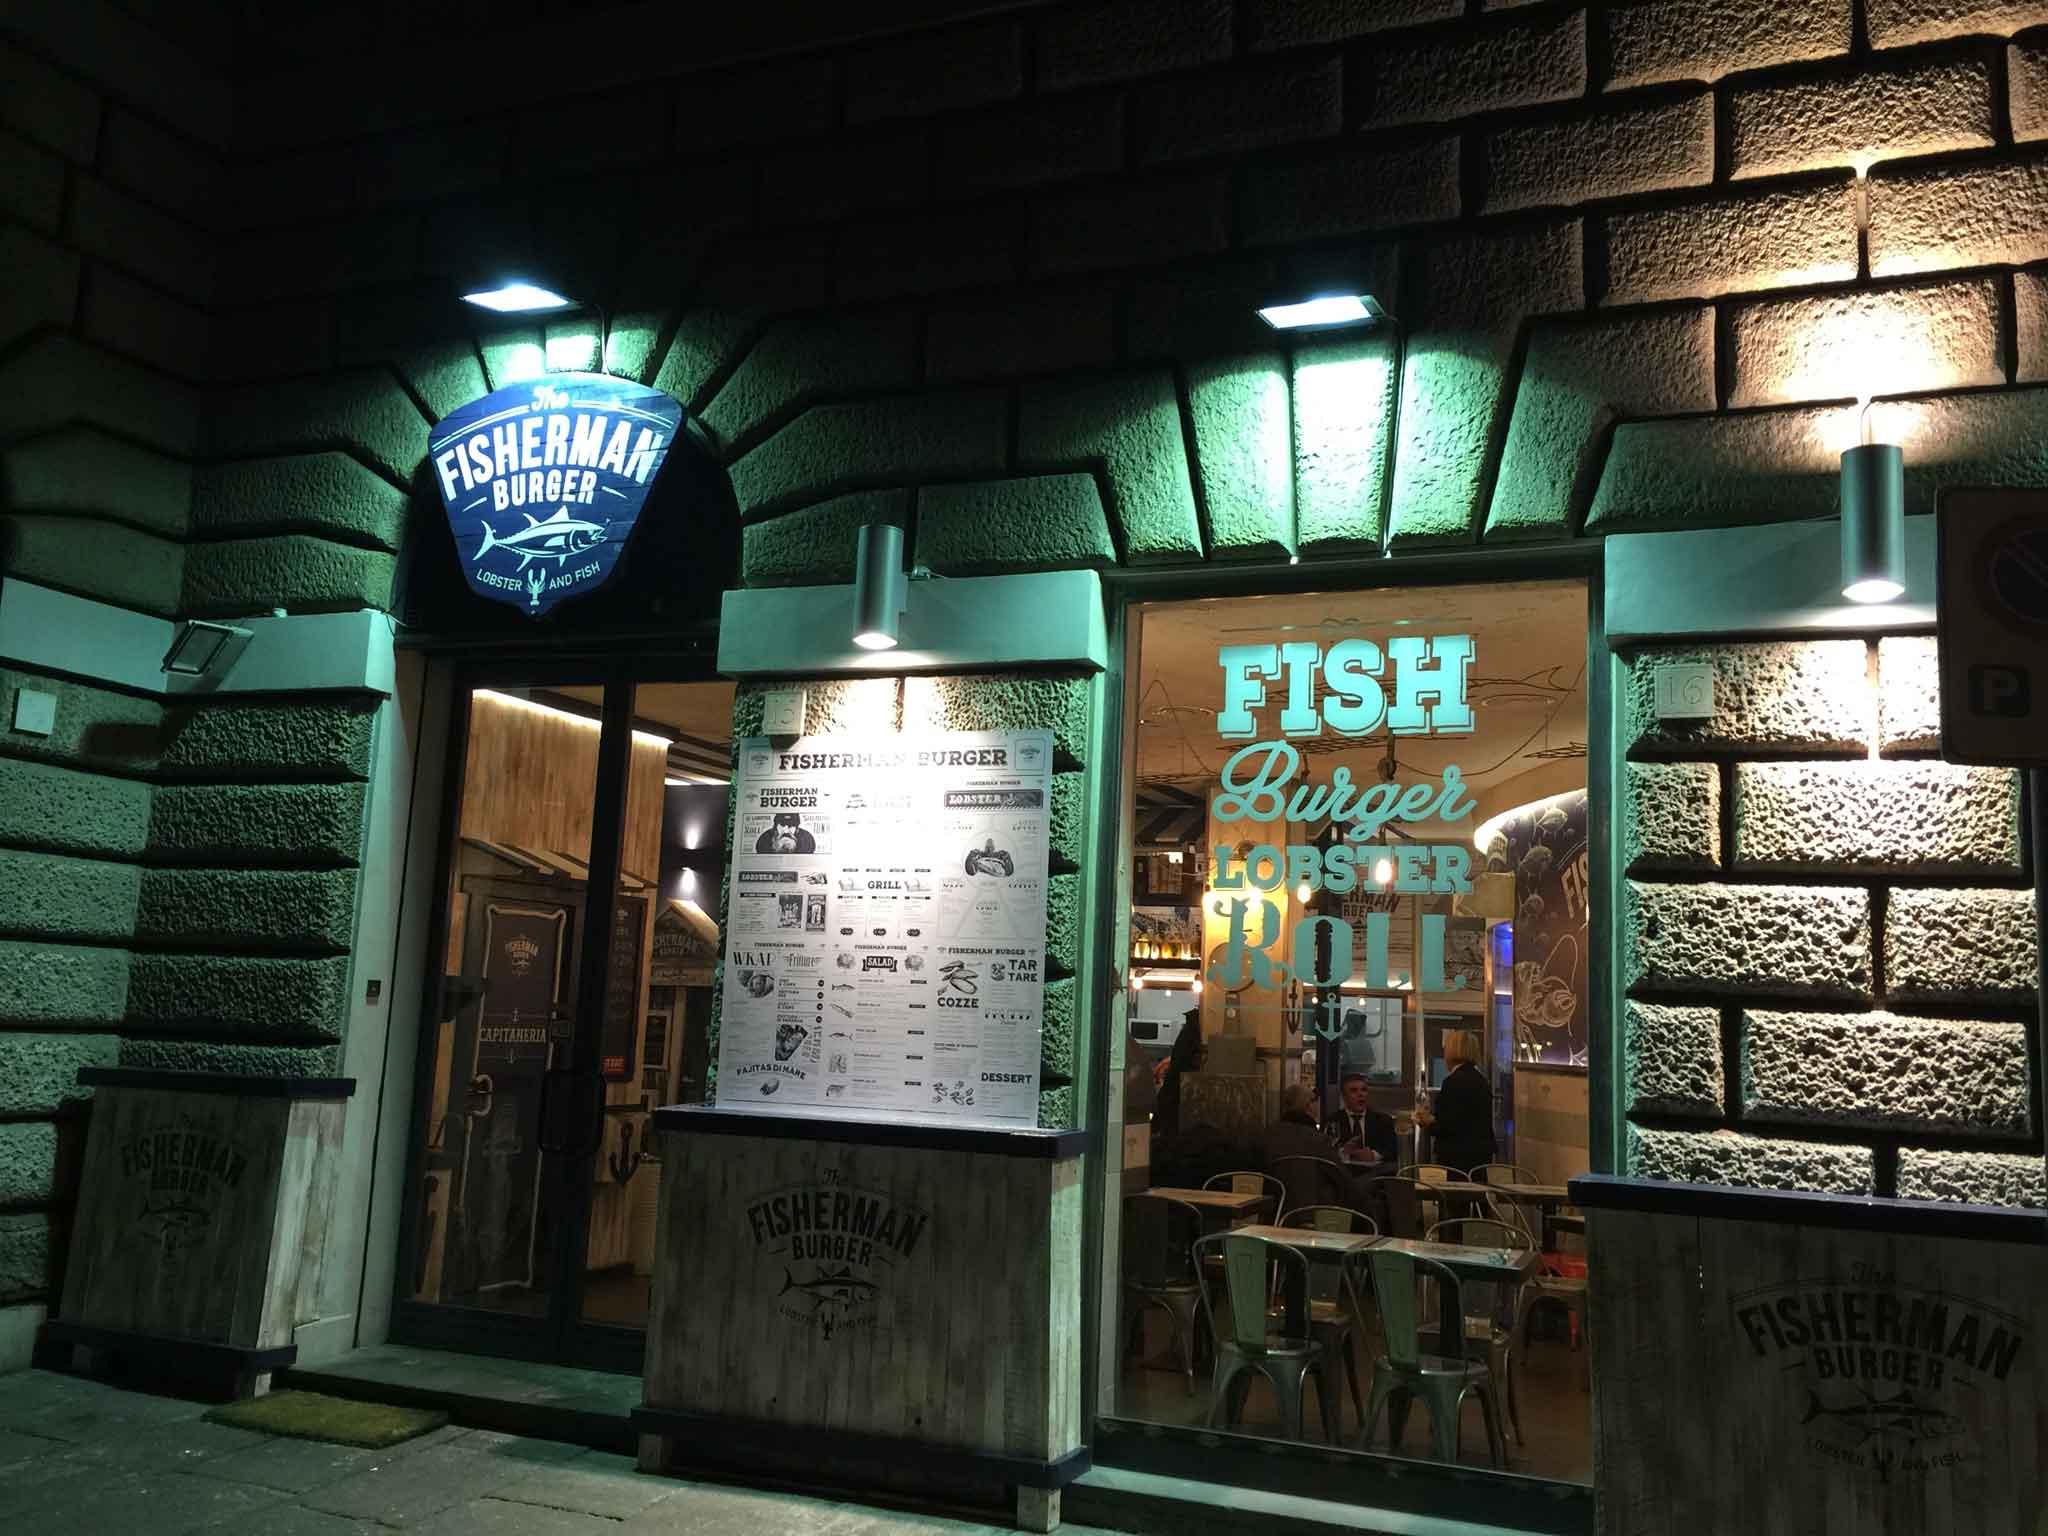 Fisherman Burger Roma